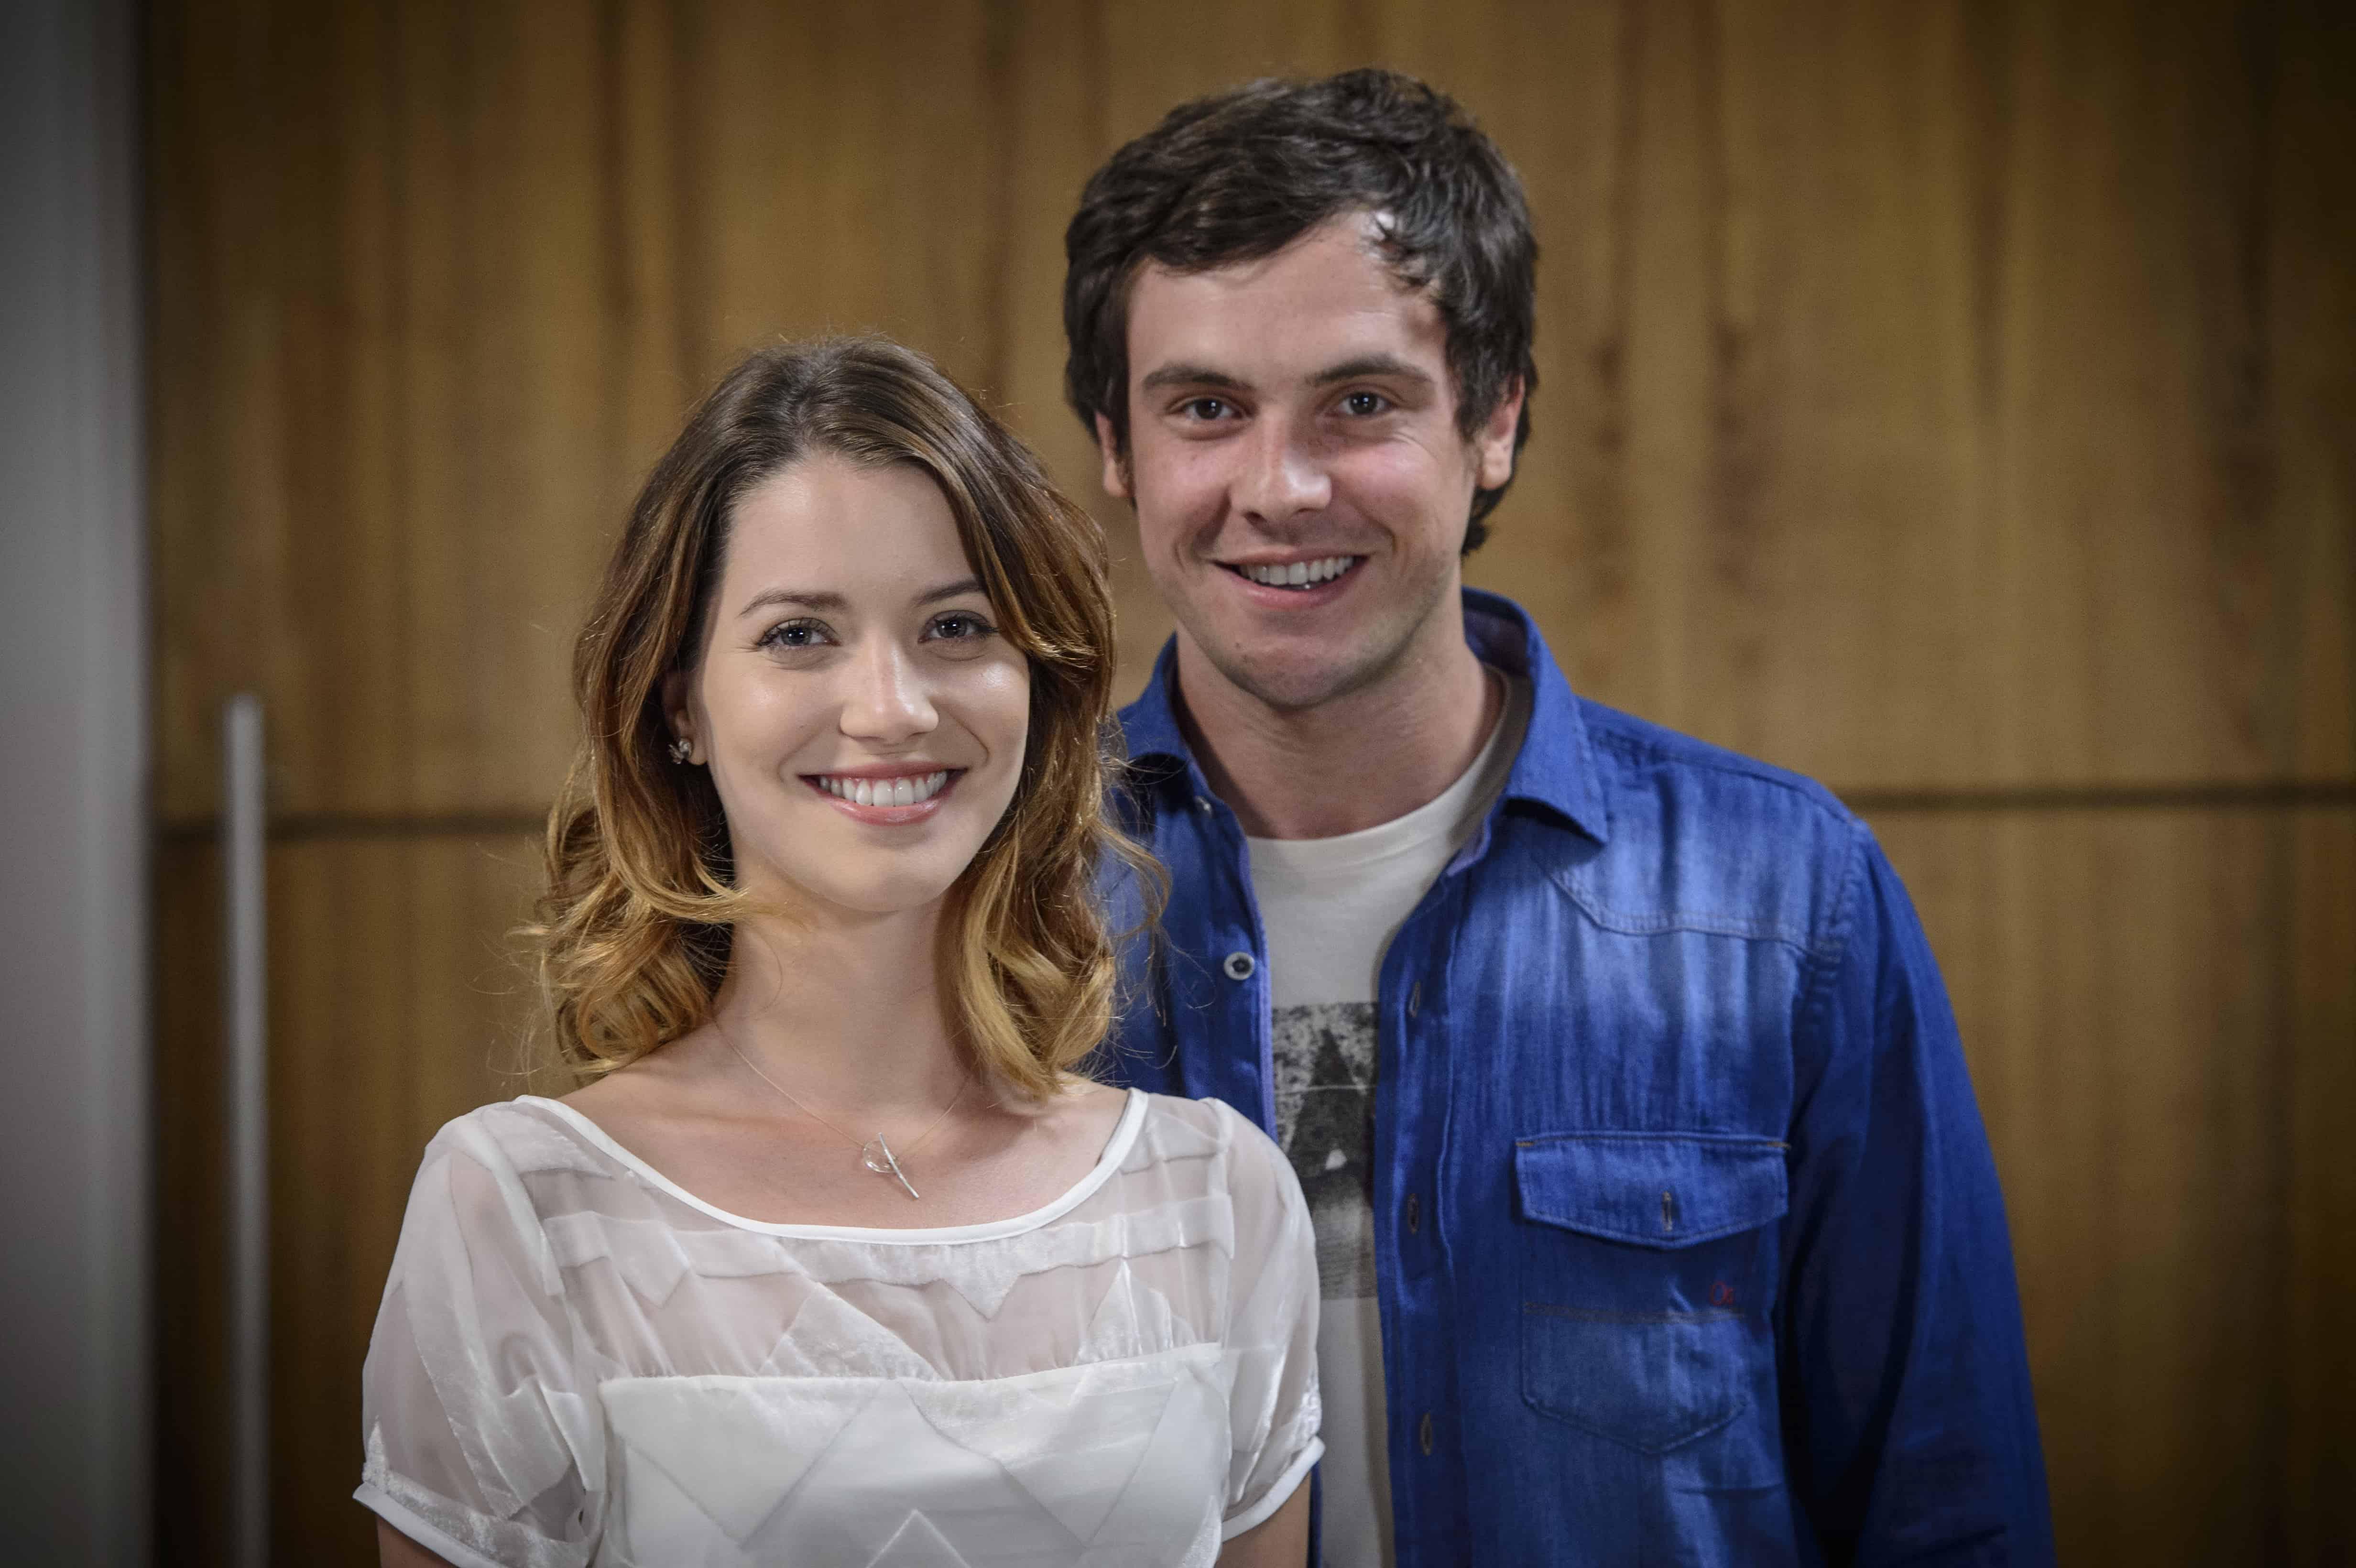 Nathalia Dill e Sérgio Guizé terminam namoro de dois anos